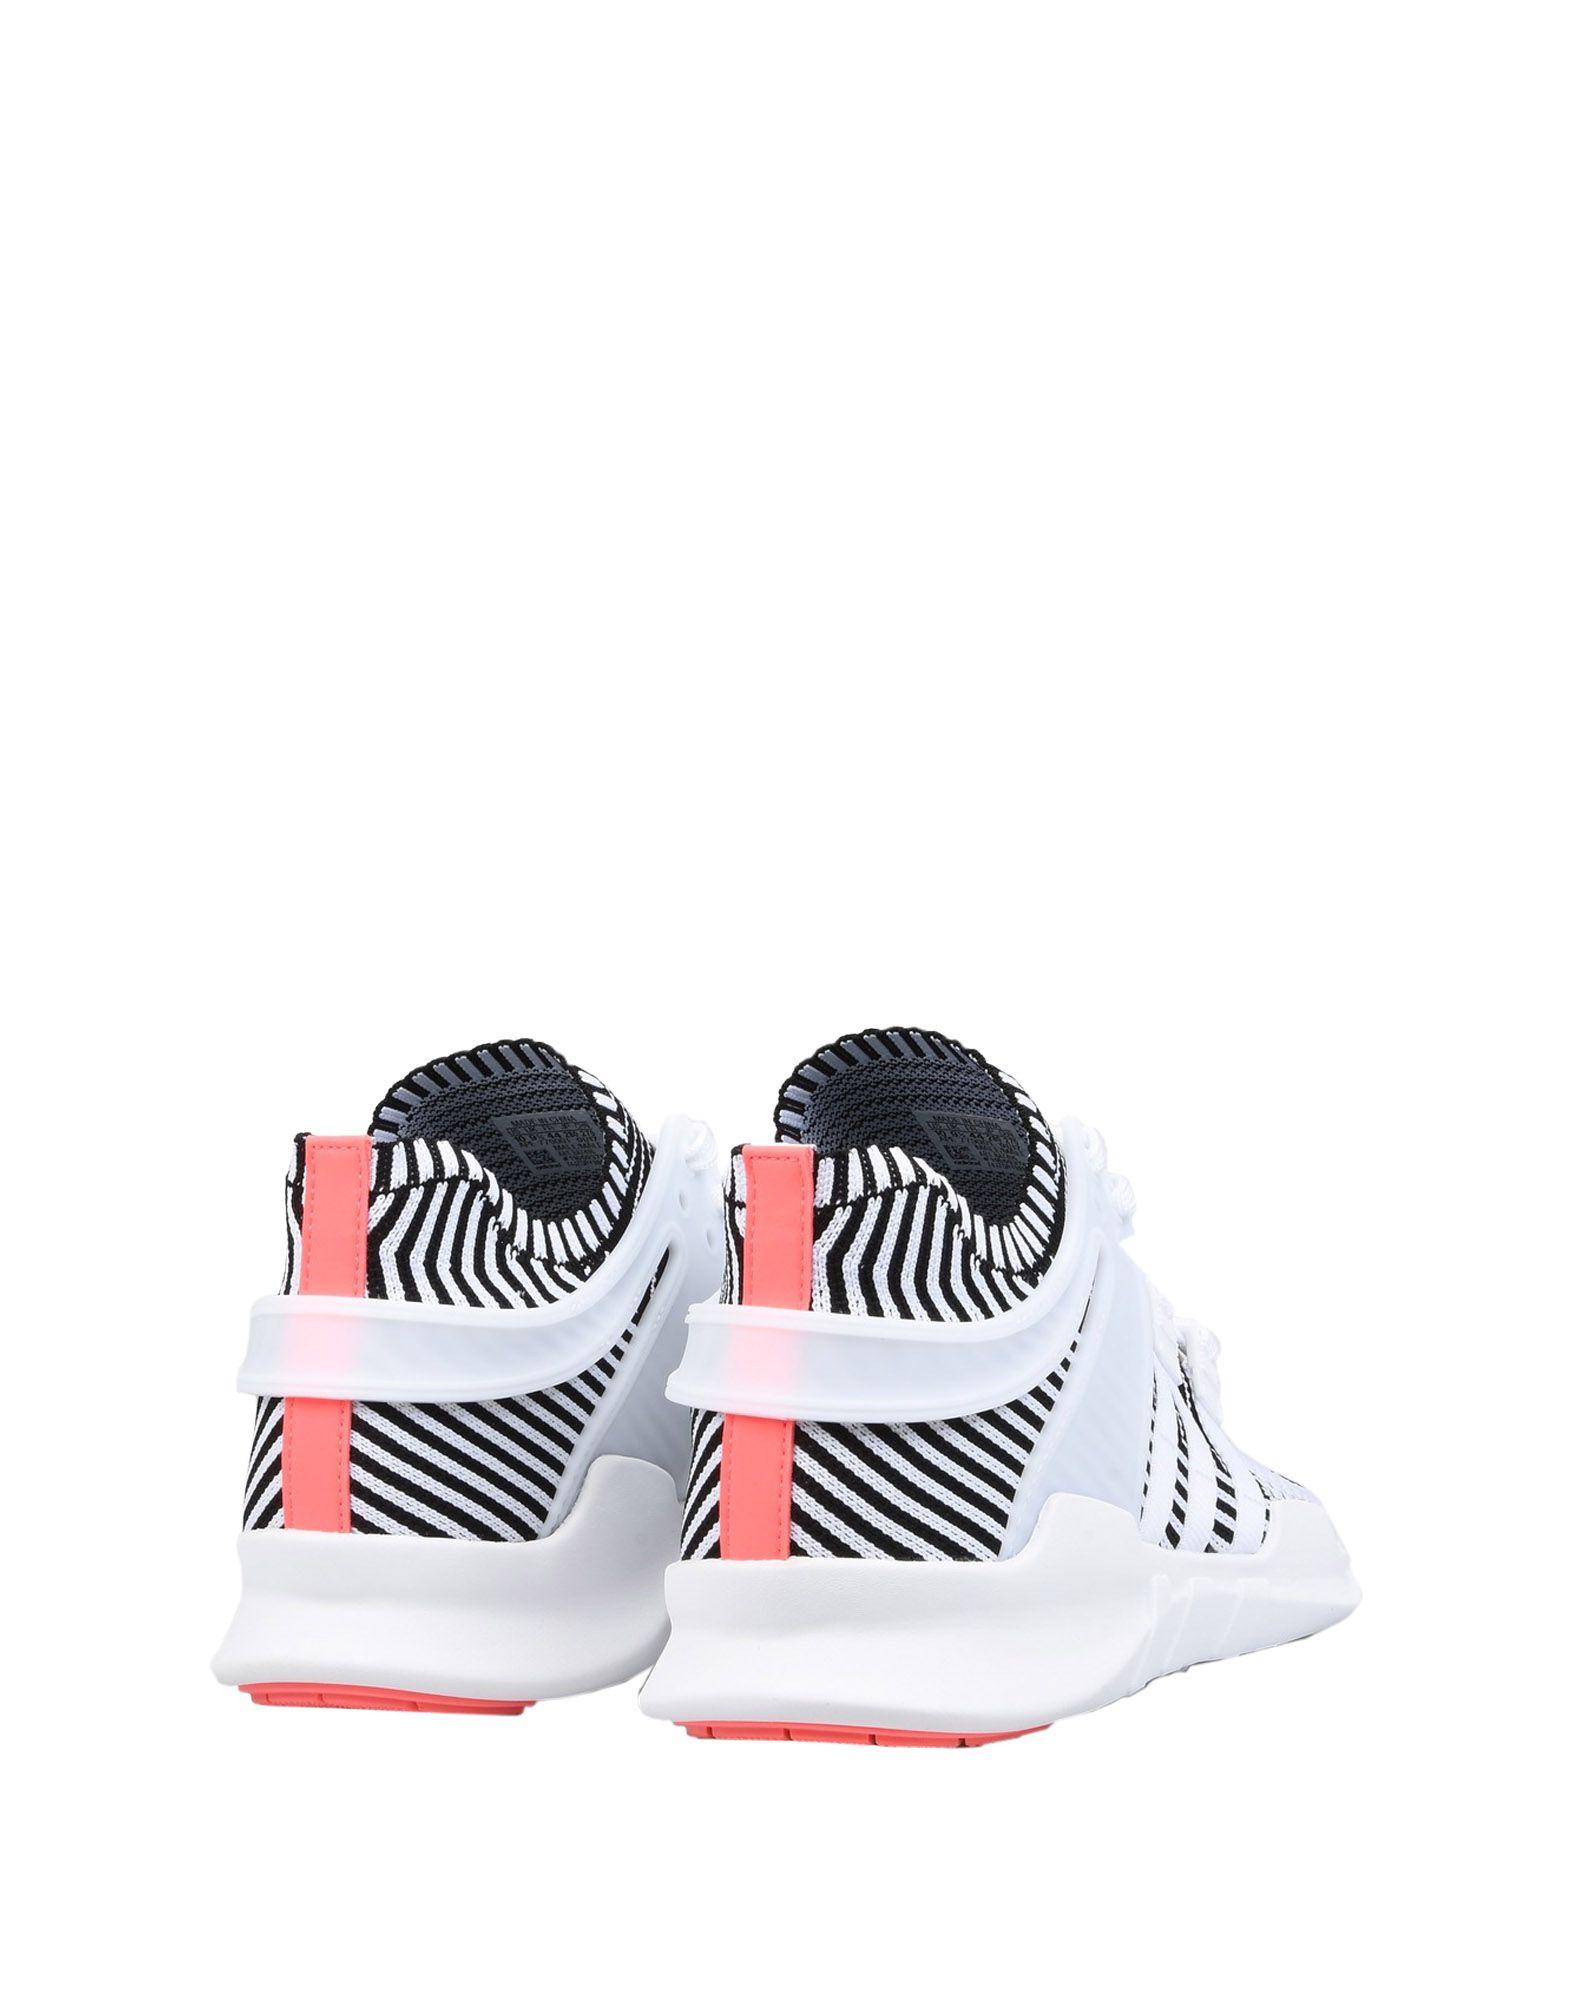 Adidas Originals Eqt Support Adv Pk  11241374HN Gute Qualität beliebte Schuhe